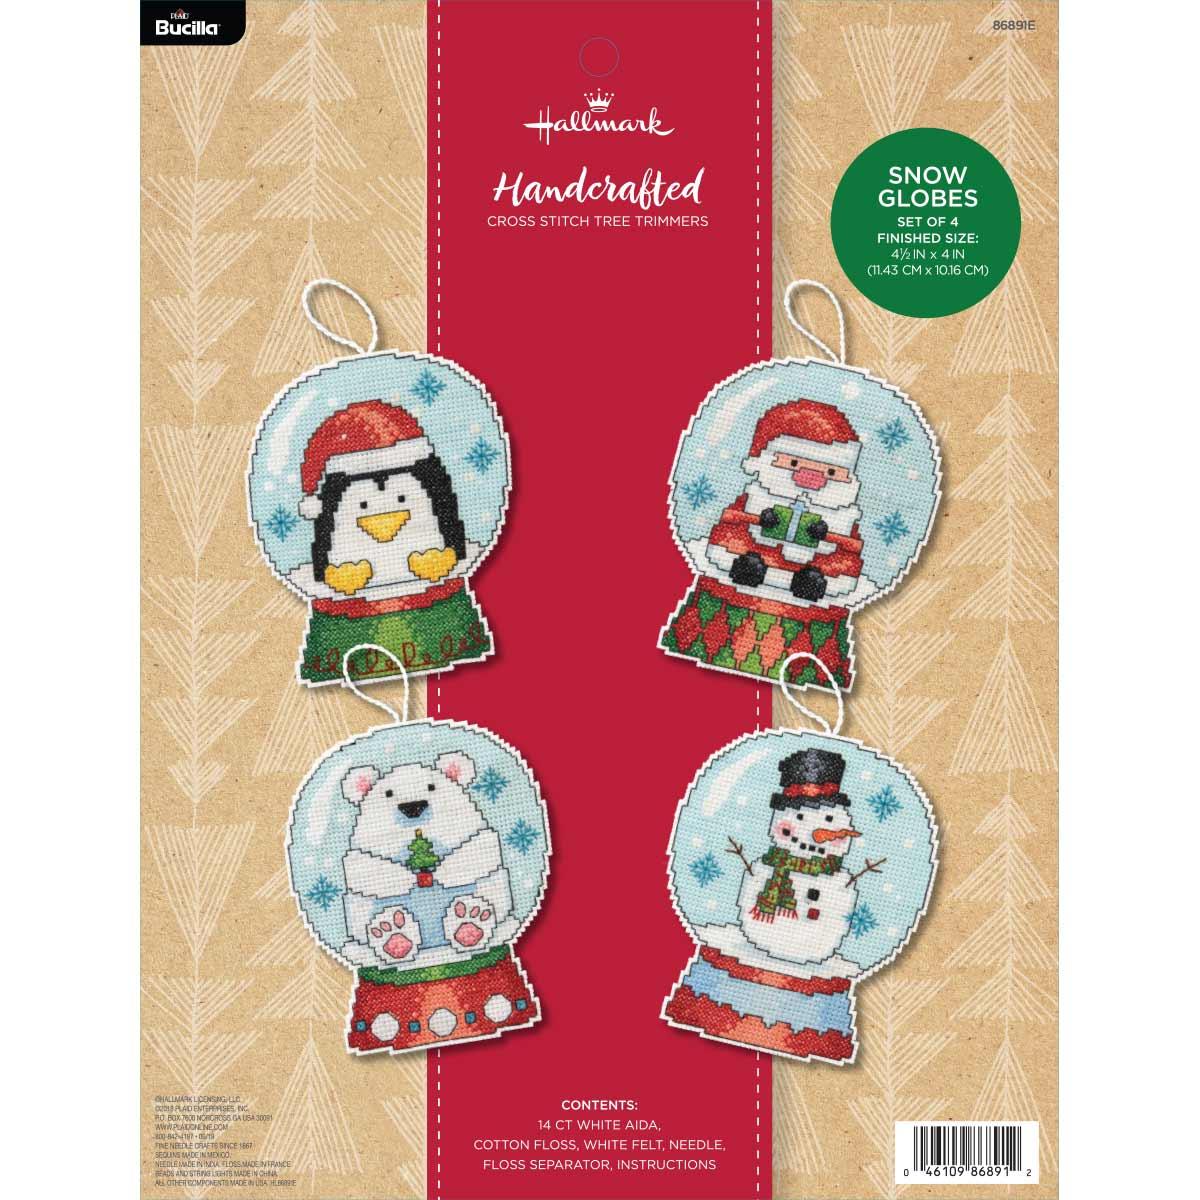 Bucilla ® Seasonal - Counted Cross Stitch - Tree Trimmer Kits - Hallmark - Snow Globes